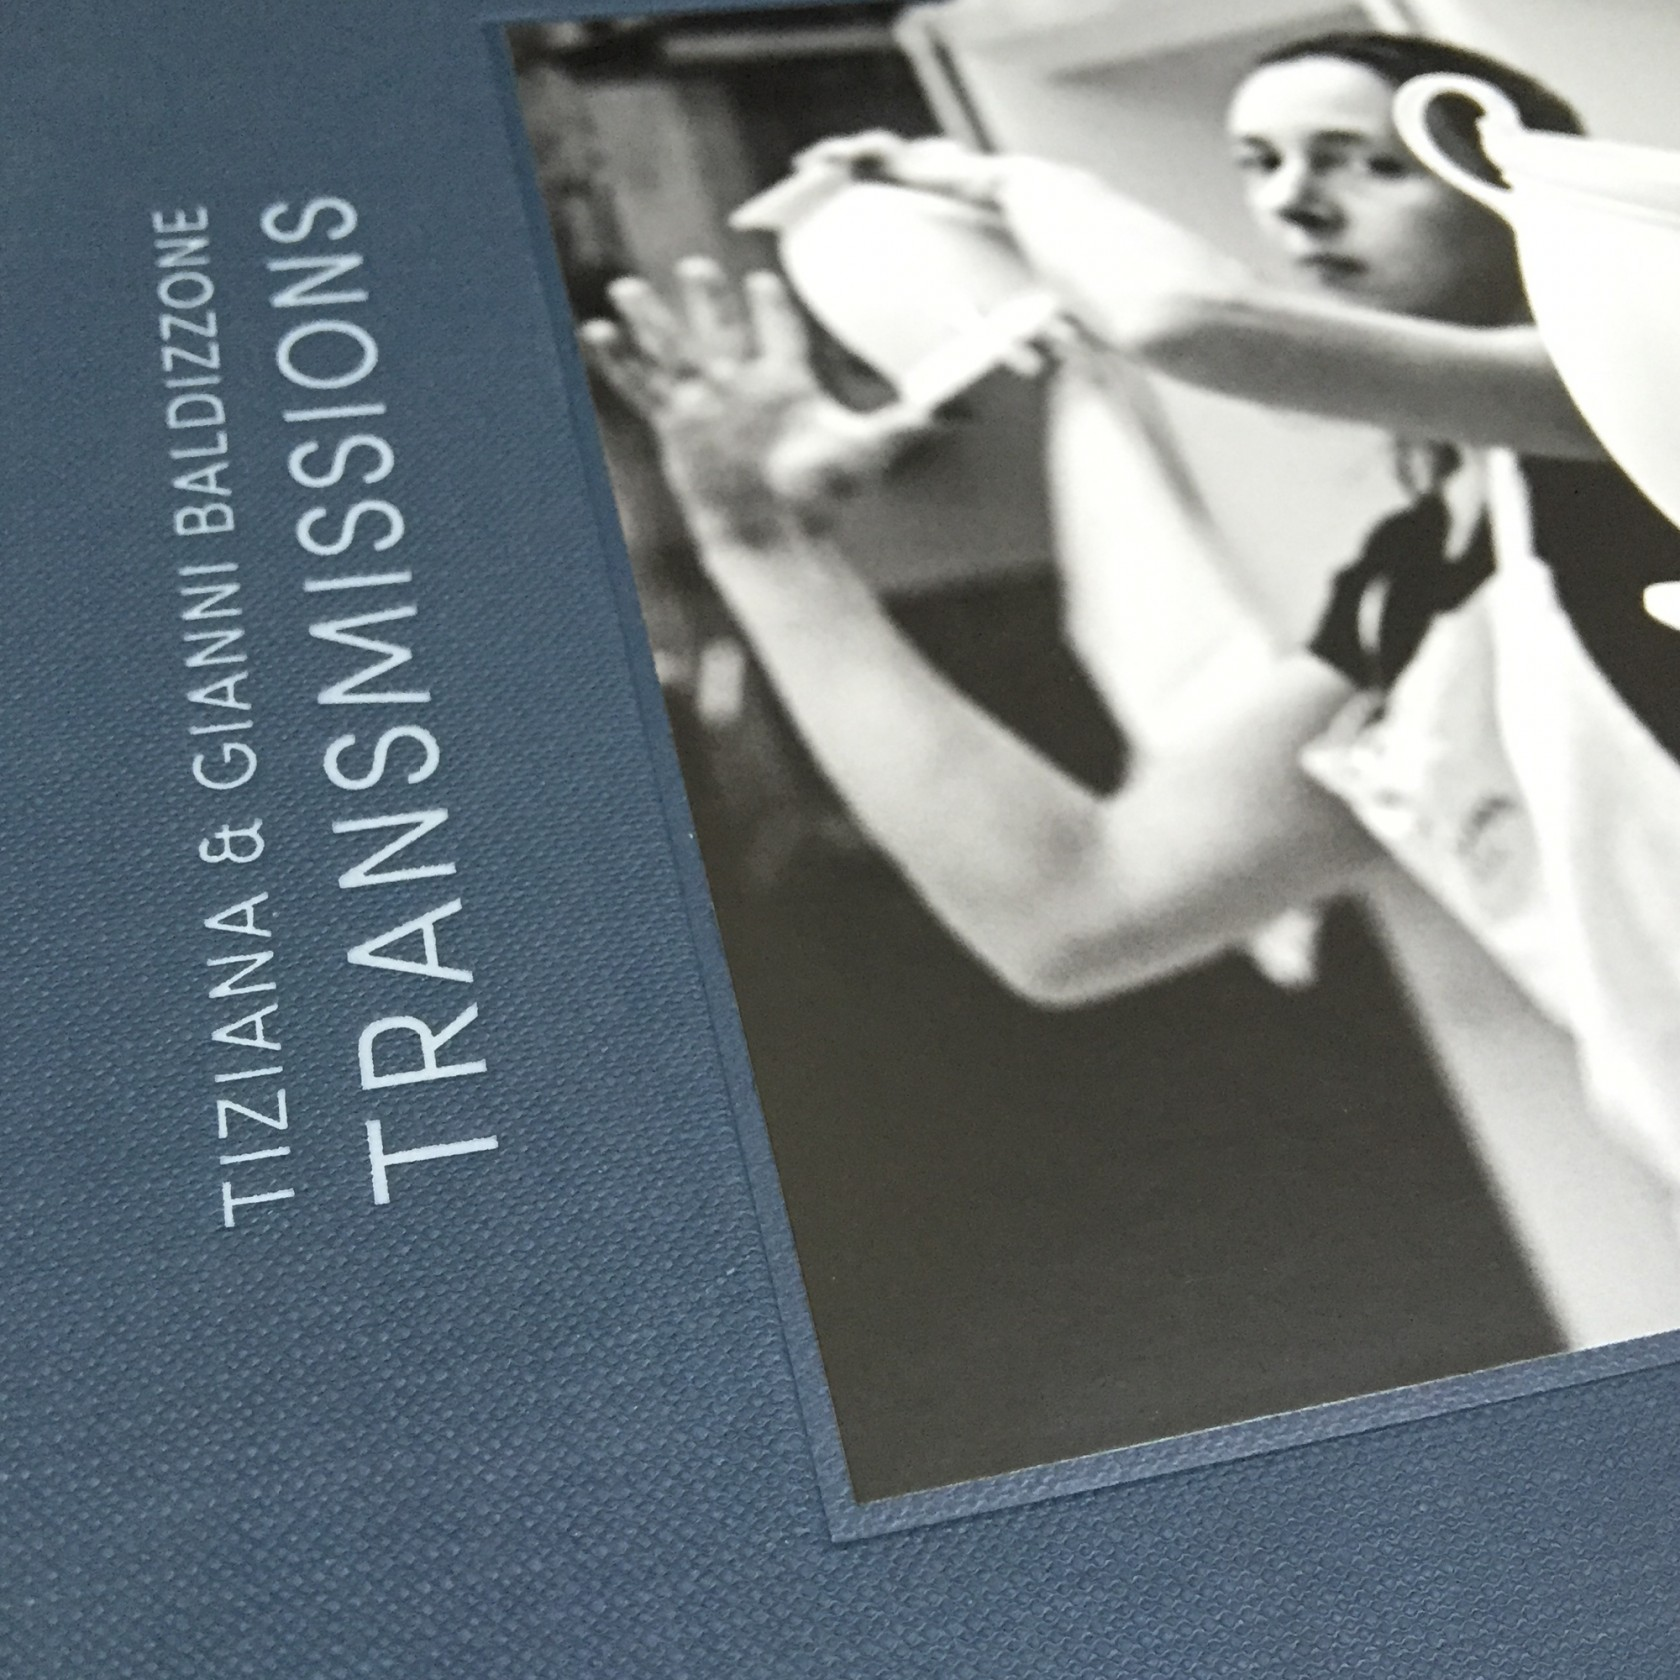 fouinzanardi -  fz_print-books_editionsduchene44